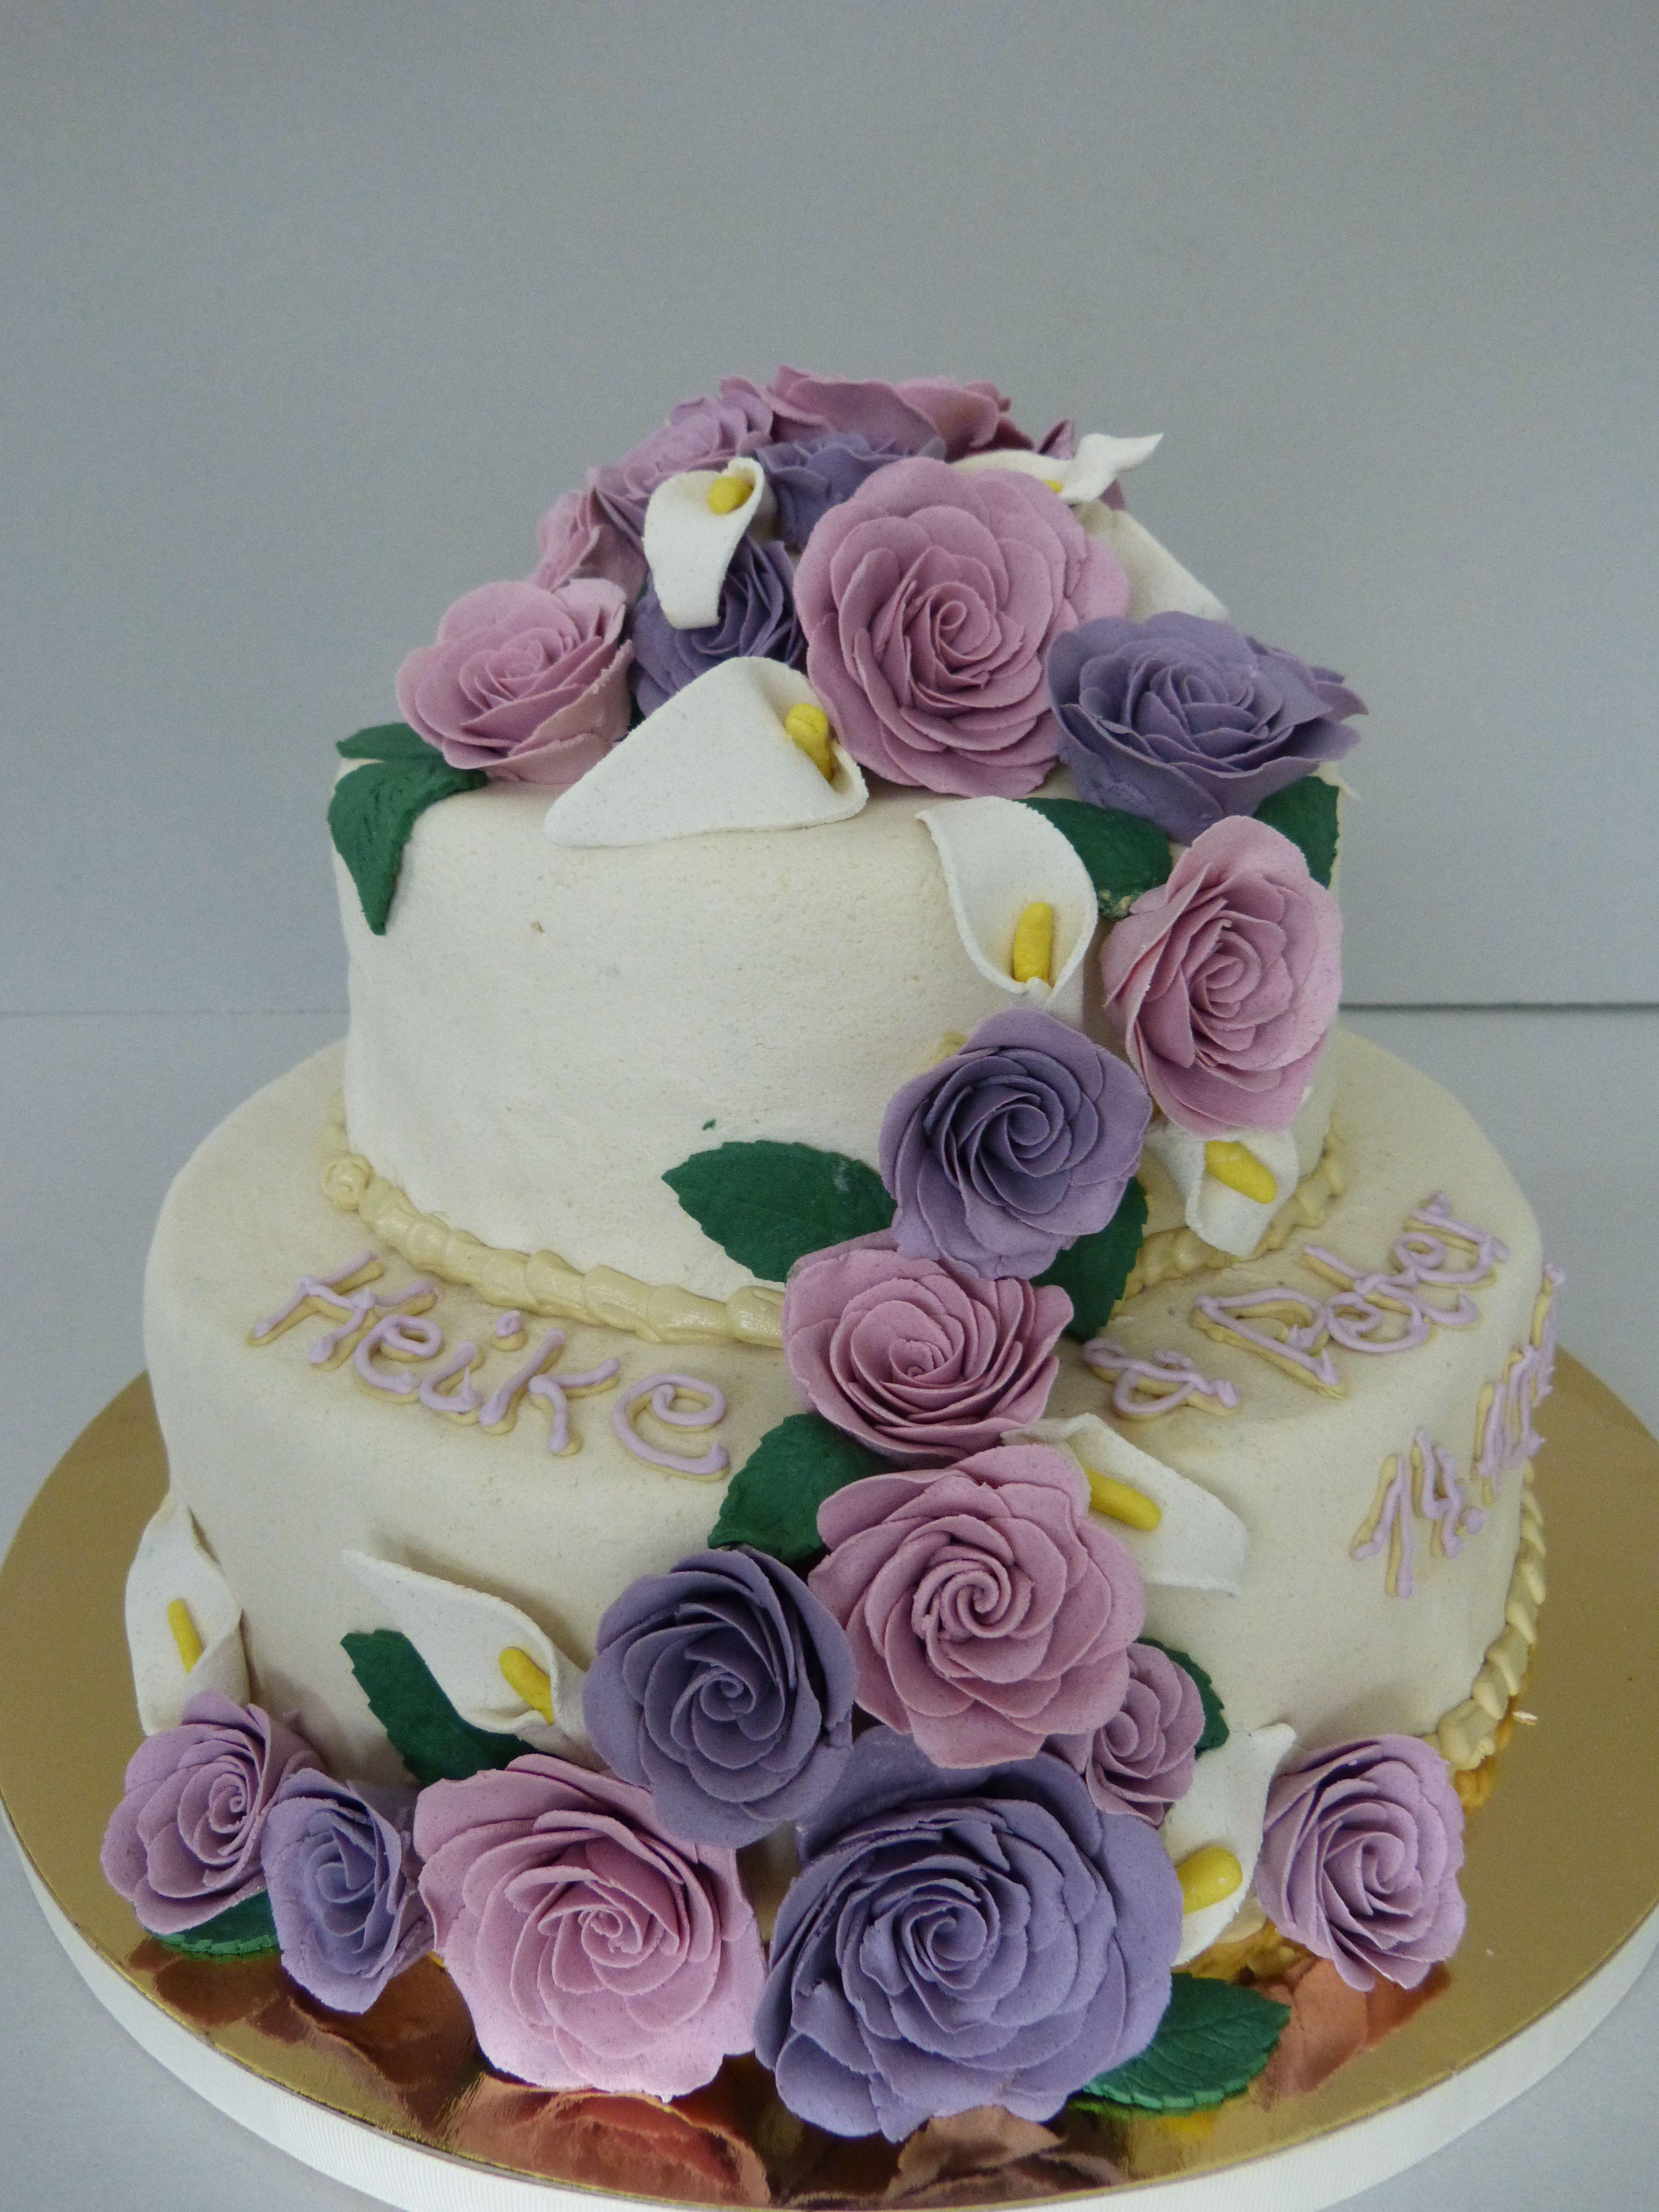 Wedding Cake Marzipan Roses Rosen Hochzeitstorte Lila Rosa